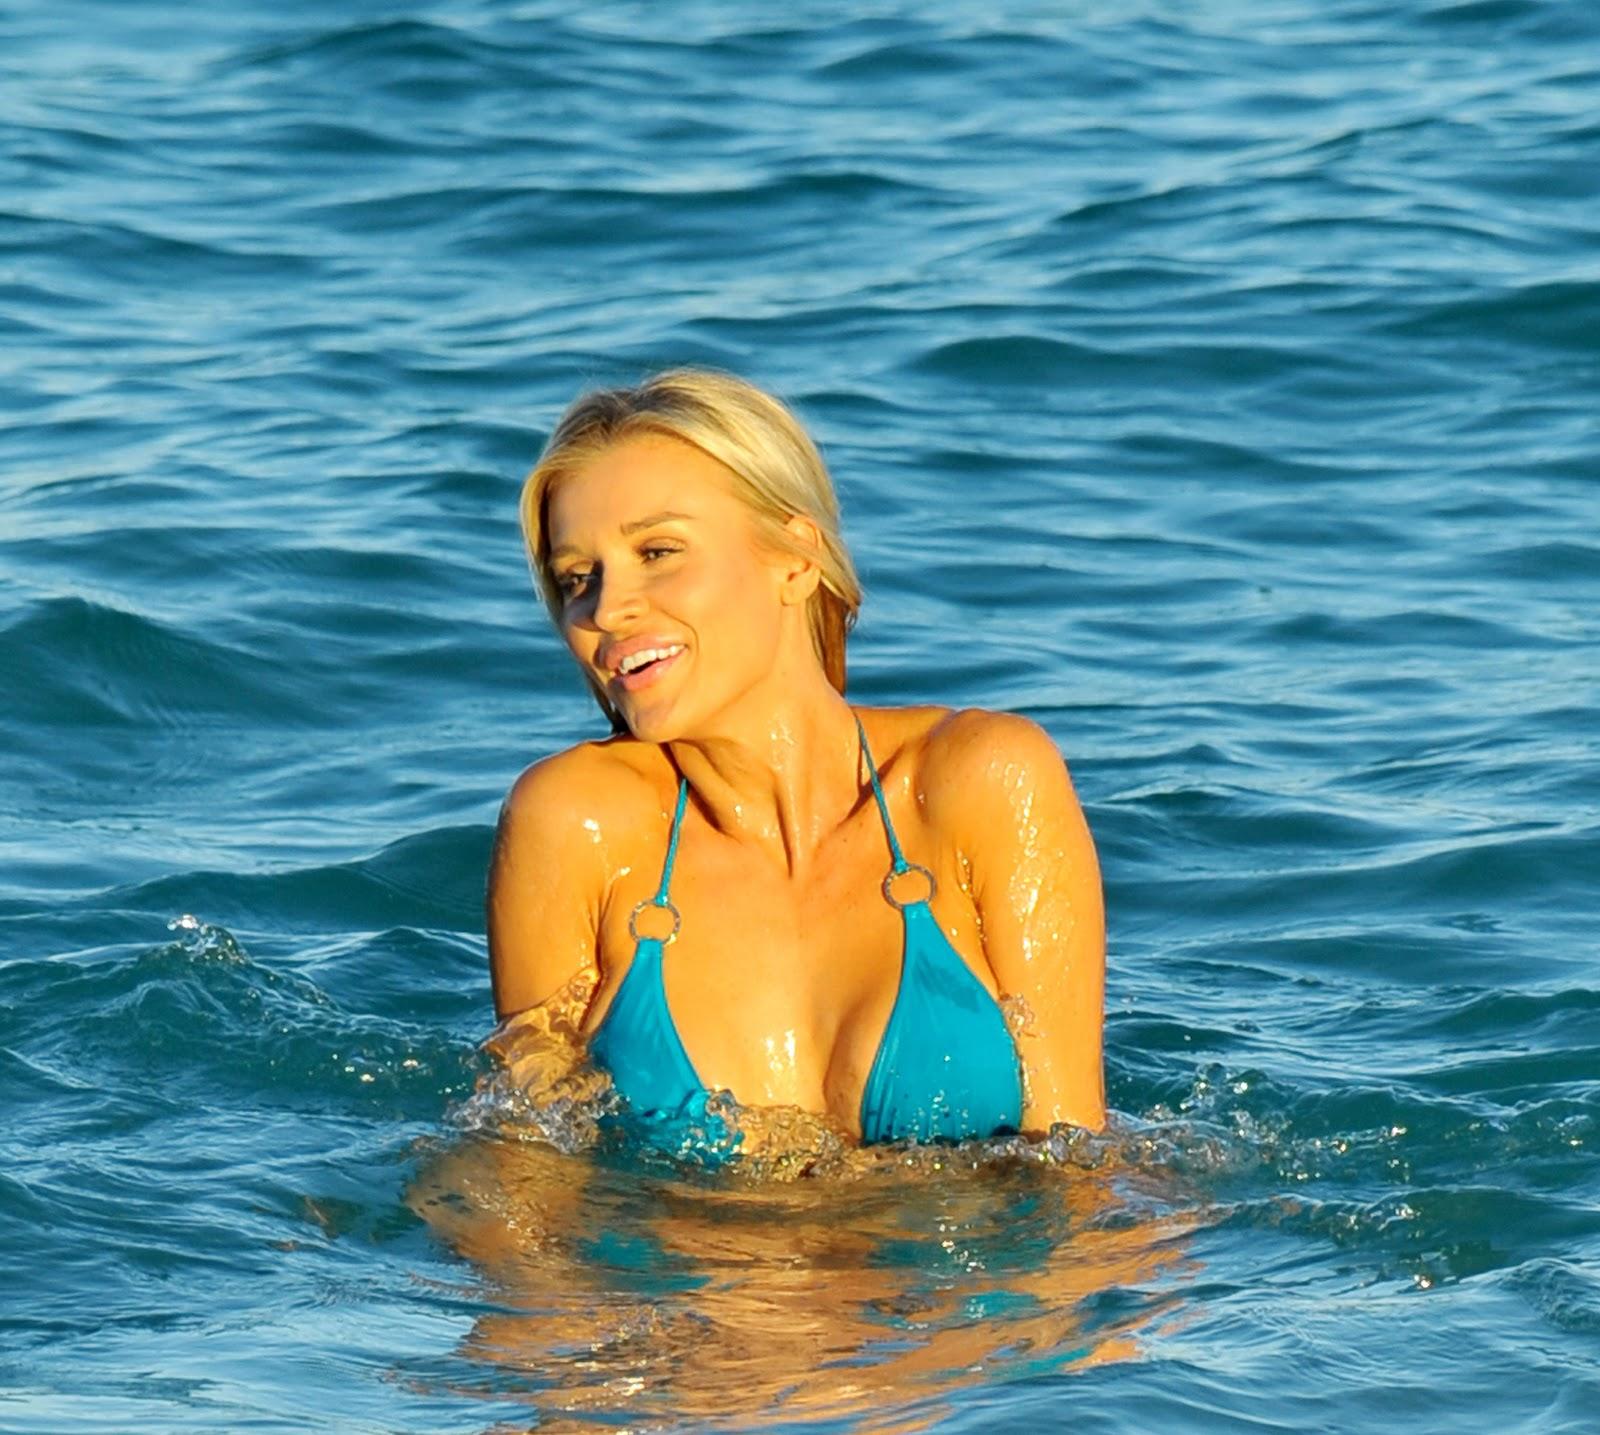 http://4.bp.blogspot.com/-YpsxiLHxUZk/UJkQ_jVoG2I/AAAAAAAAEM0/vV5uc-i7Ua4/s1600/Joanna+Krupa+in+Miami+bikini+on+the+beach+%2811%29.jpg